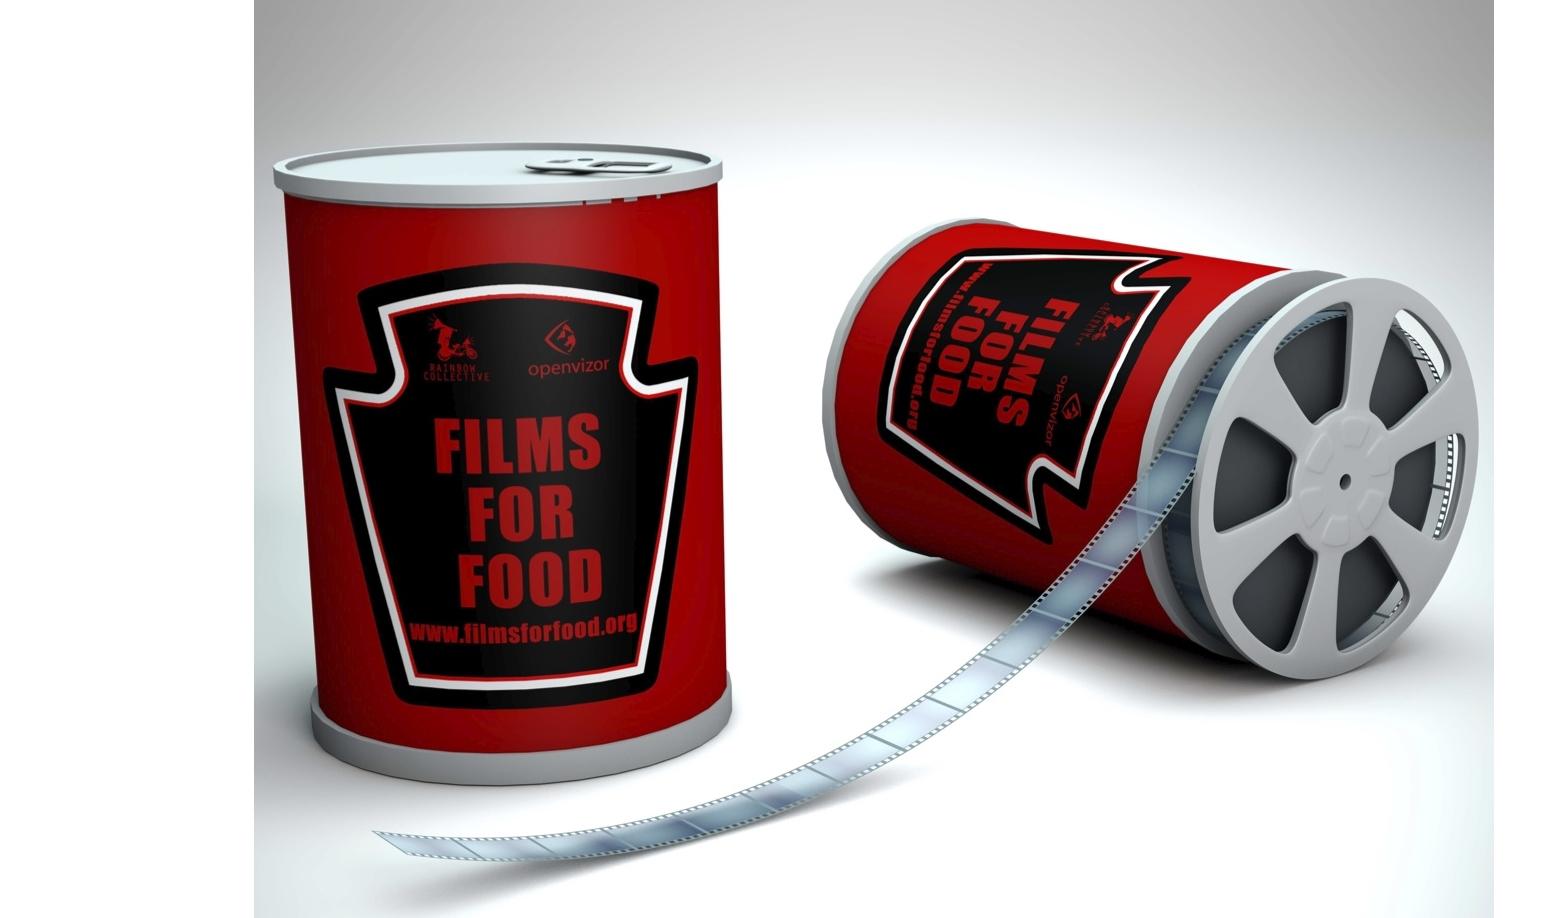 films for food.jpg